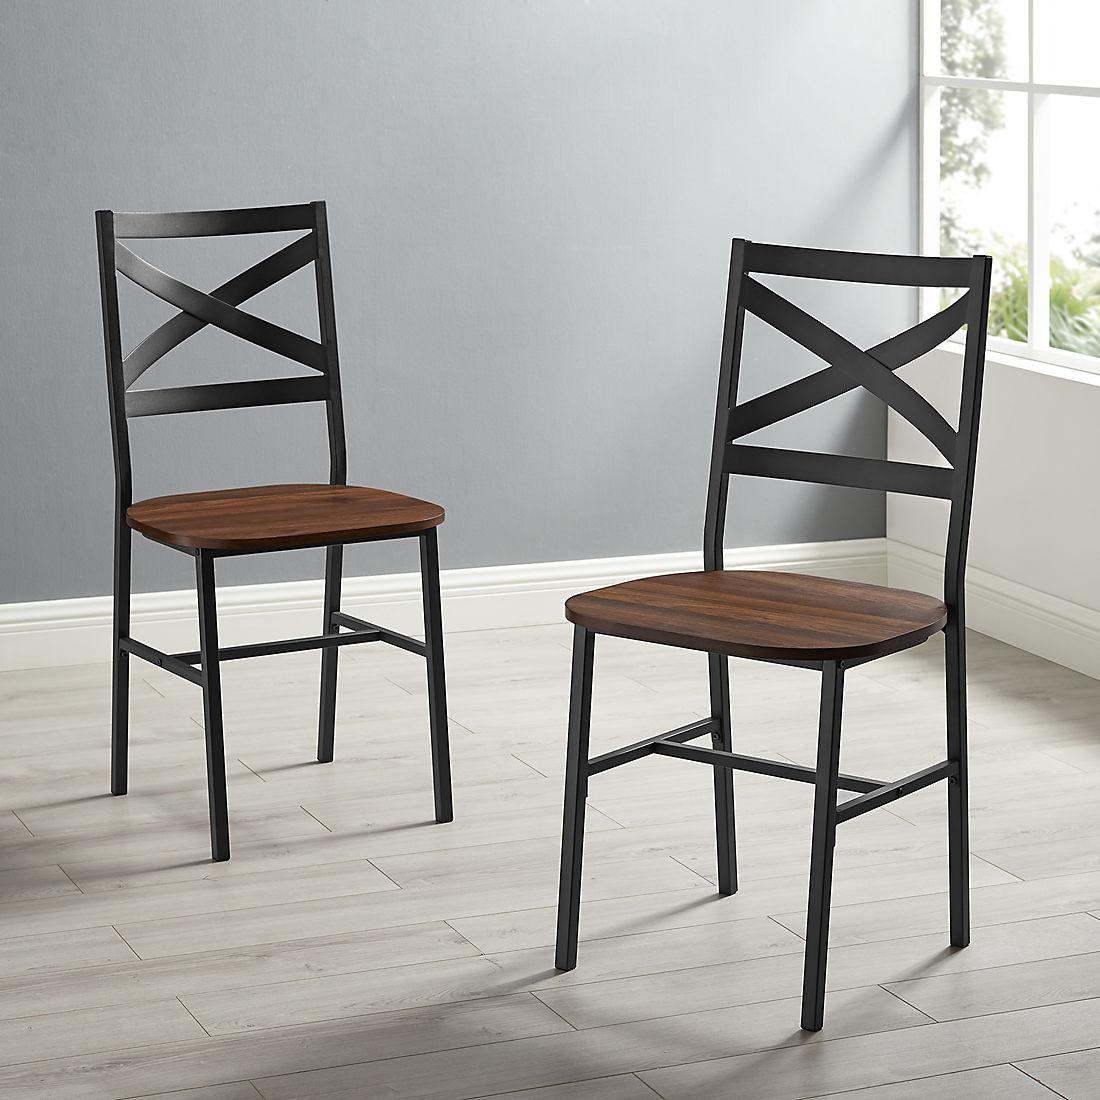 Industrial Wood Dining Chairs, 2 pk. - Dark Walnut